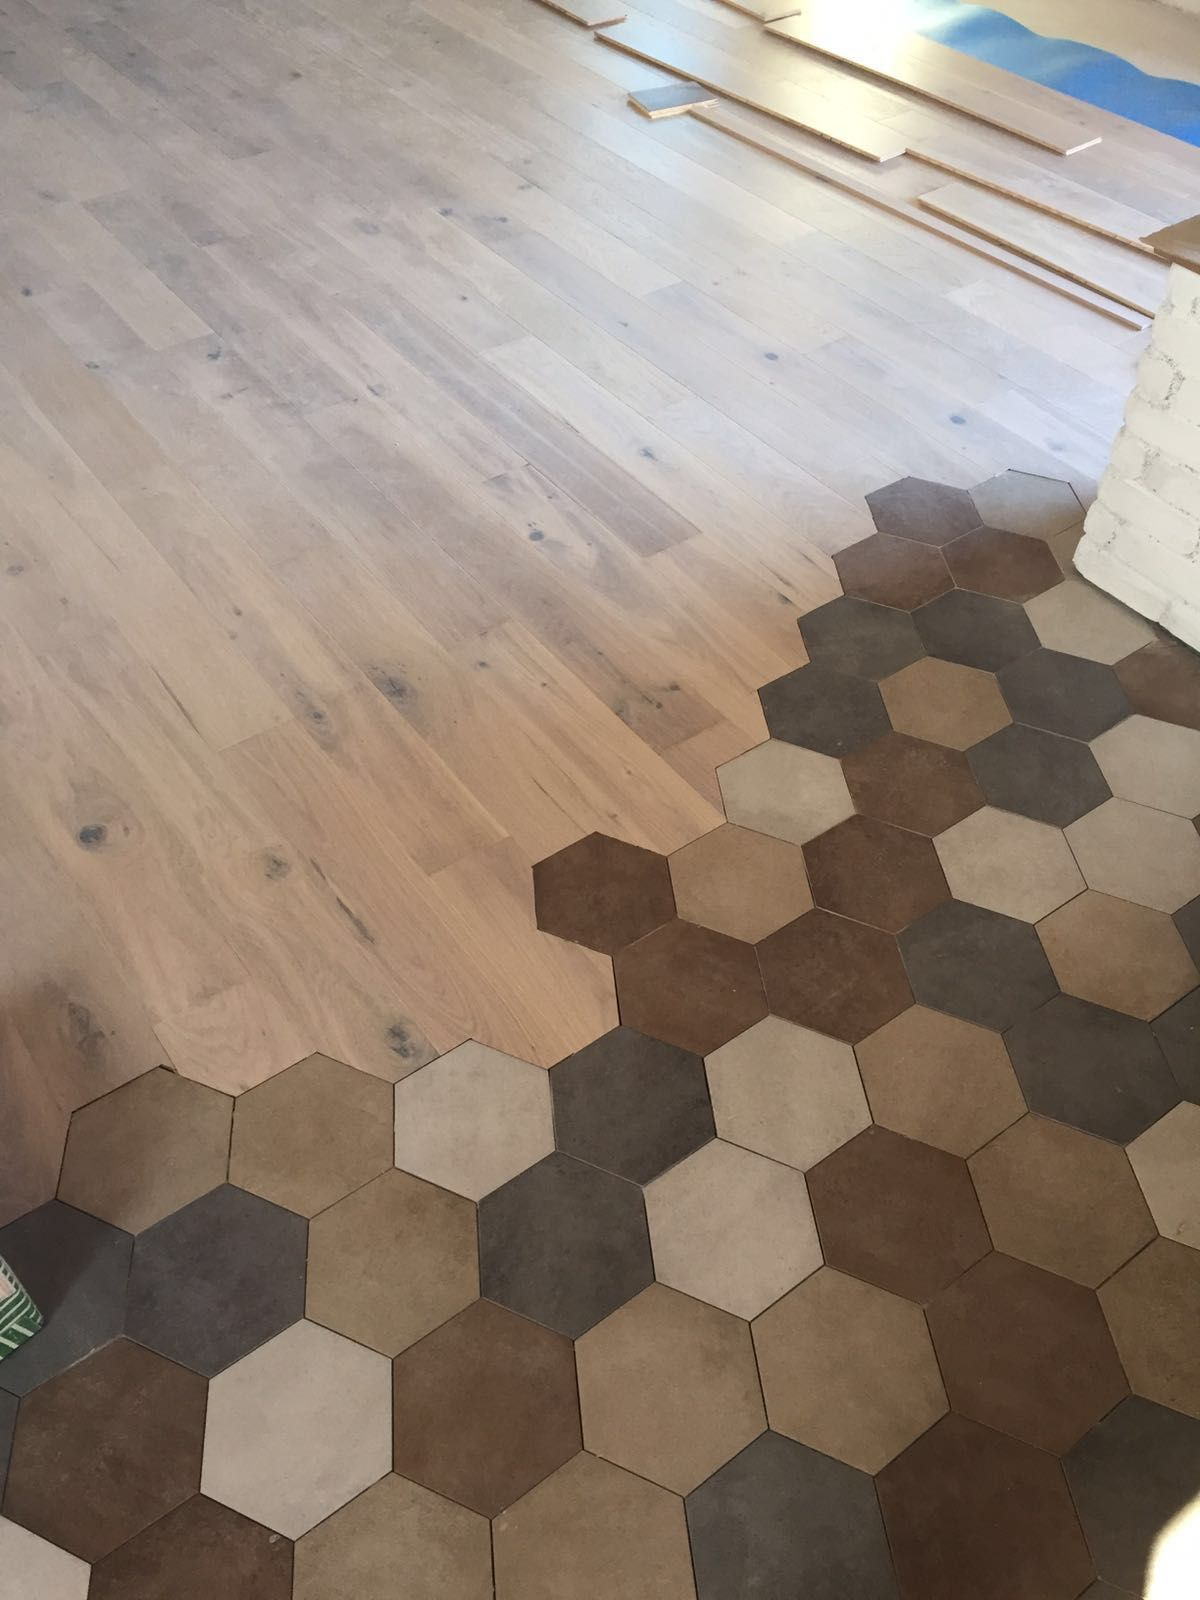 piastrella esagonale marazzi clays vs parquet rovere capuccino iperceramica home vision. Black Bedroom Furniture Sets. Home Design Ideas